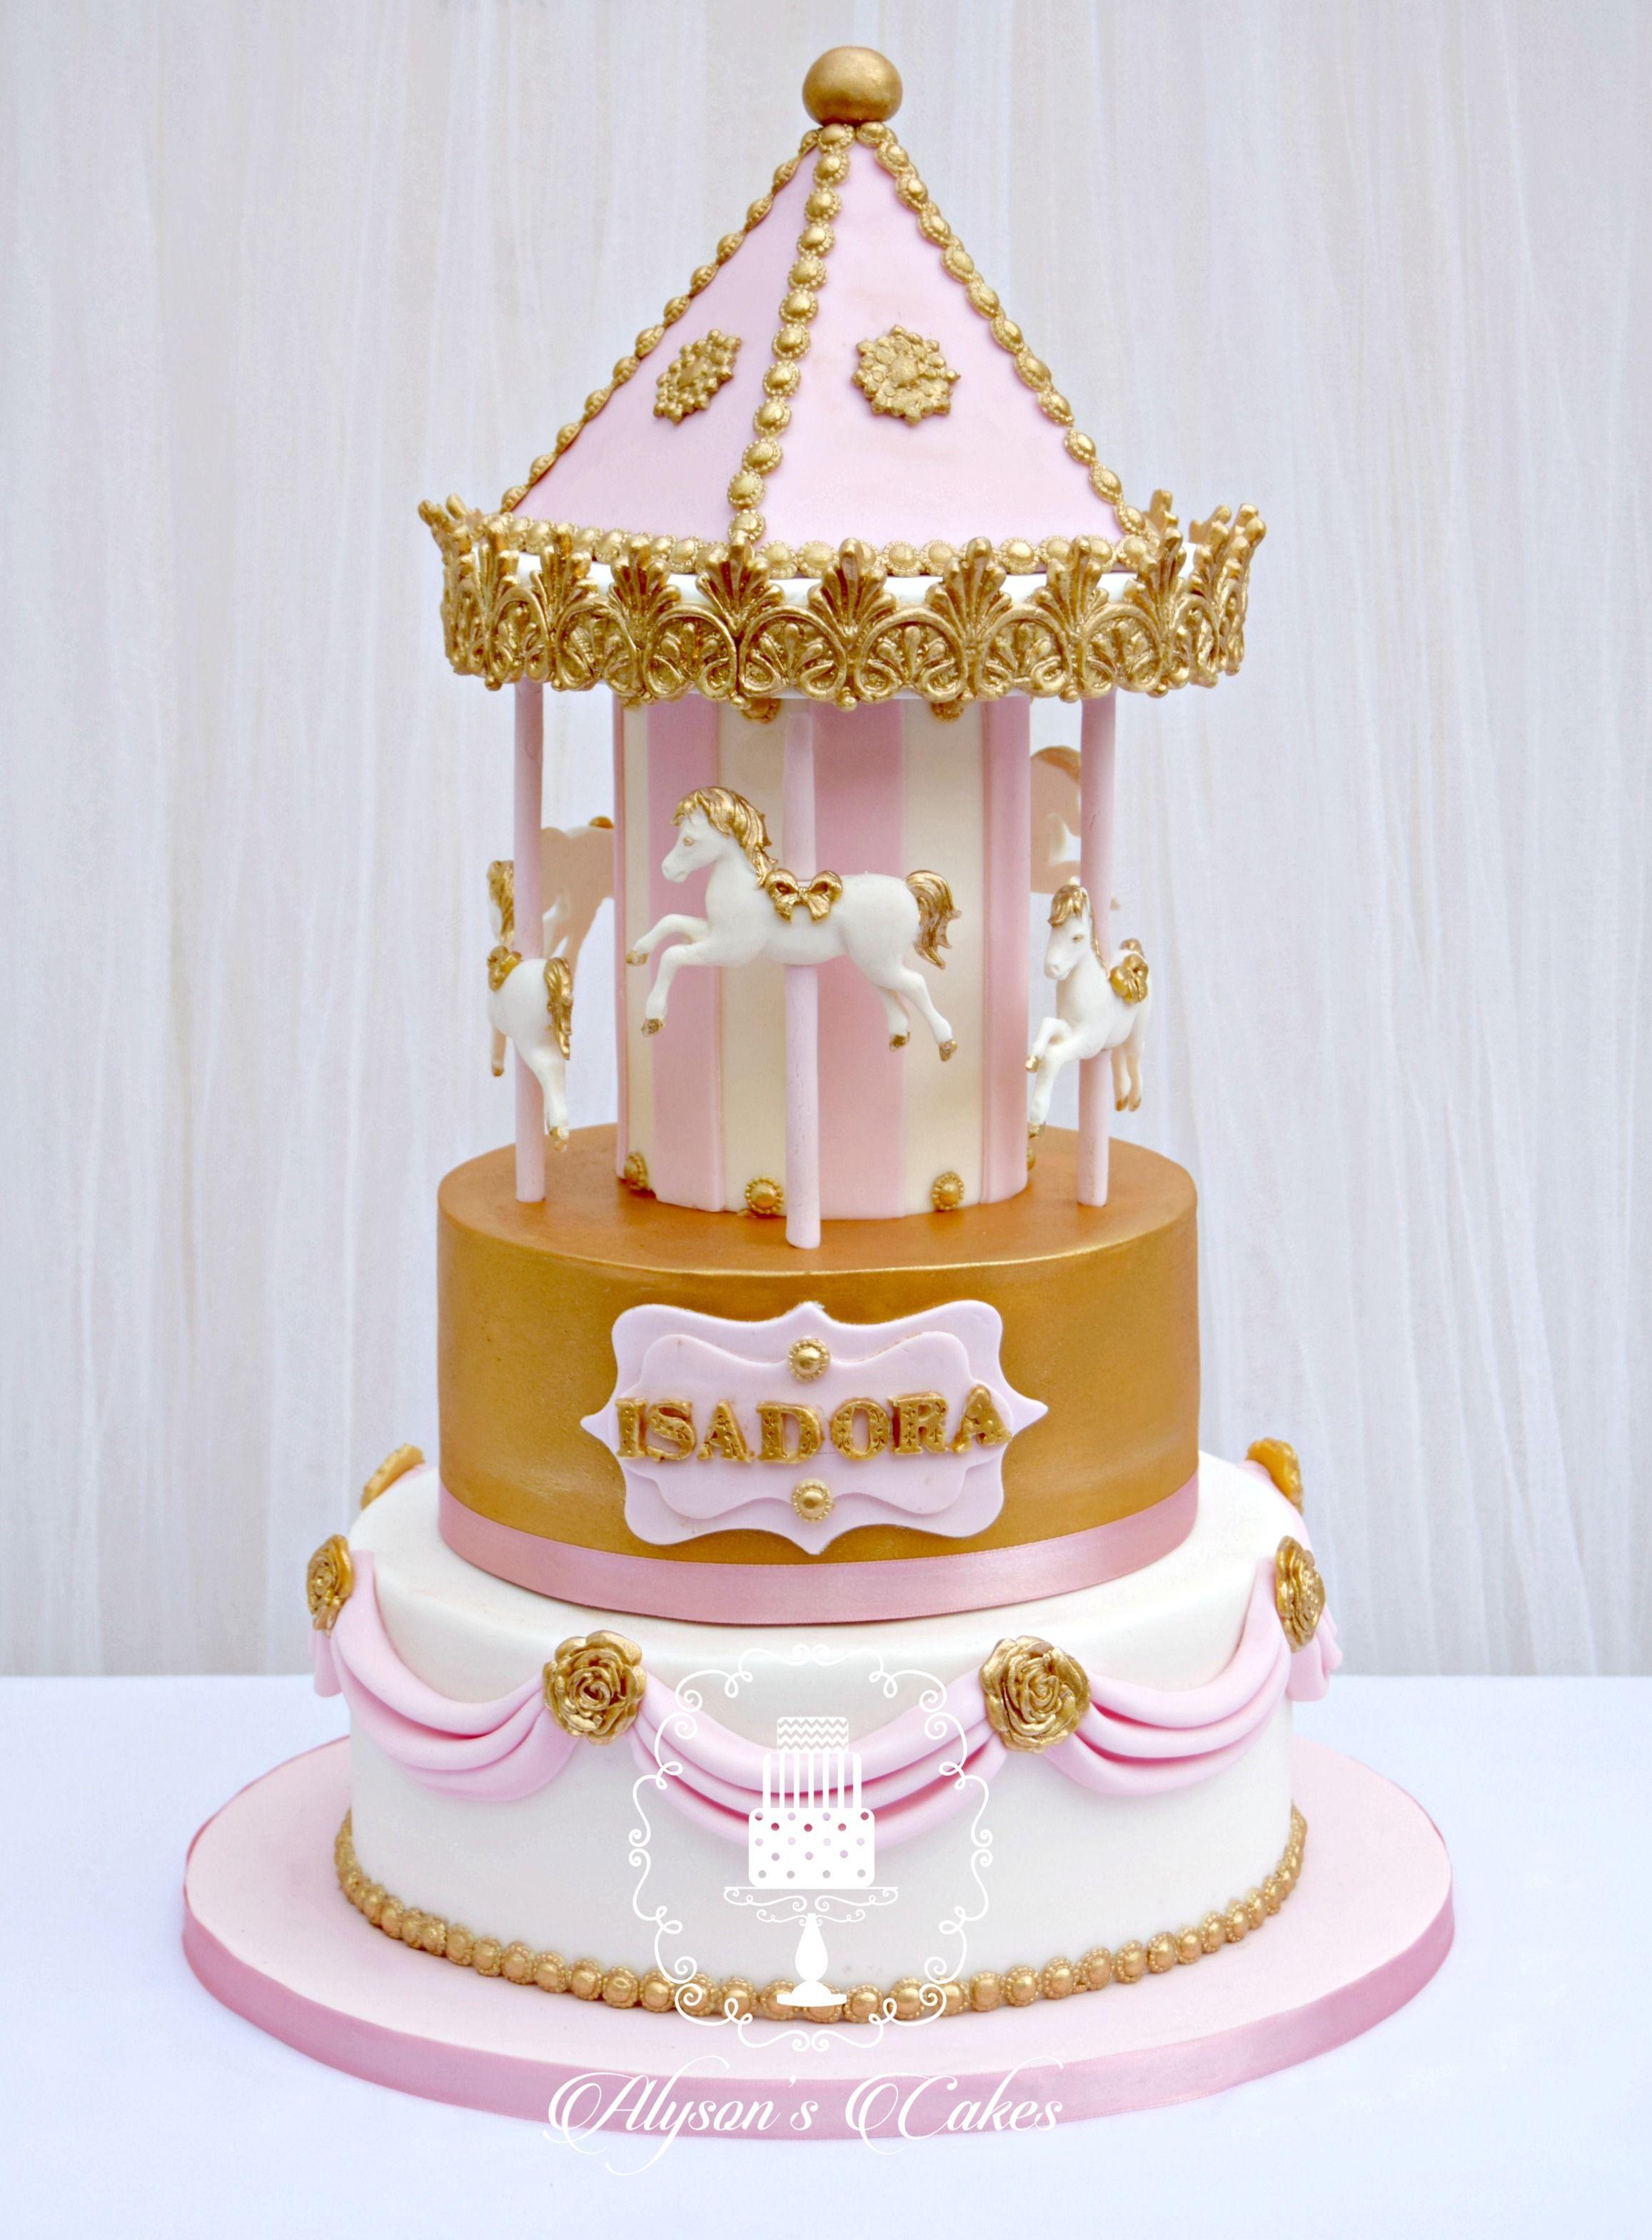 Enjoyable Girls Birthday Cake Carousel Cake In Pink And Gold Personalised Birthday Cards Akebfashionlily Jamesorg